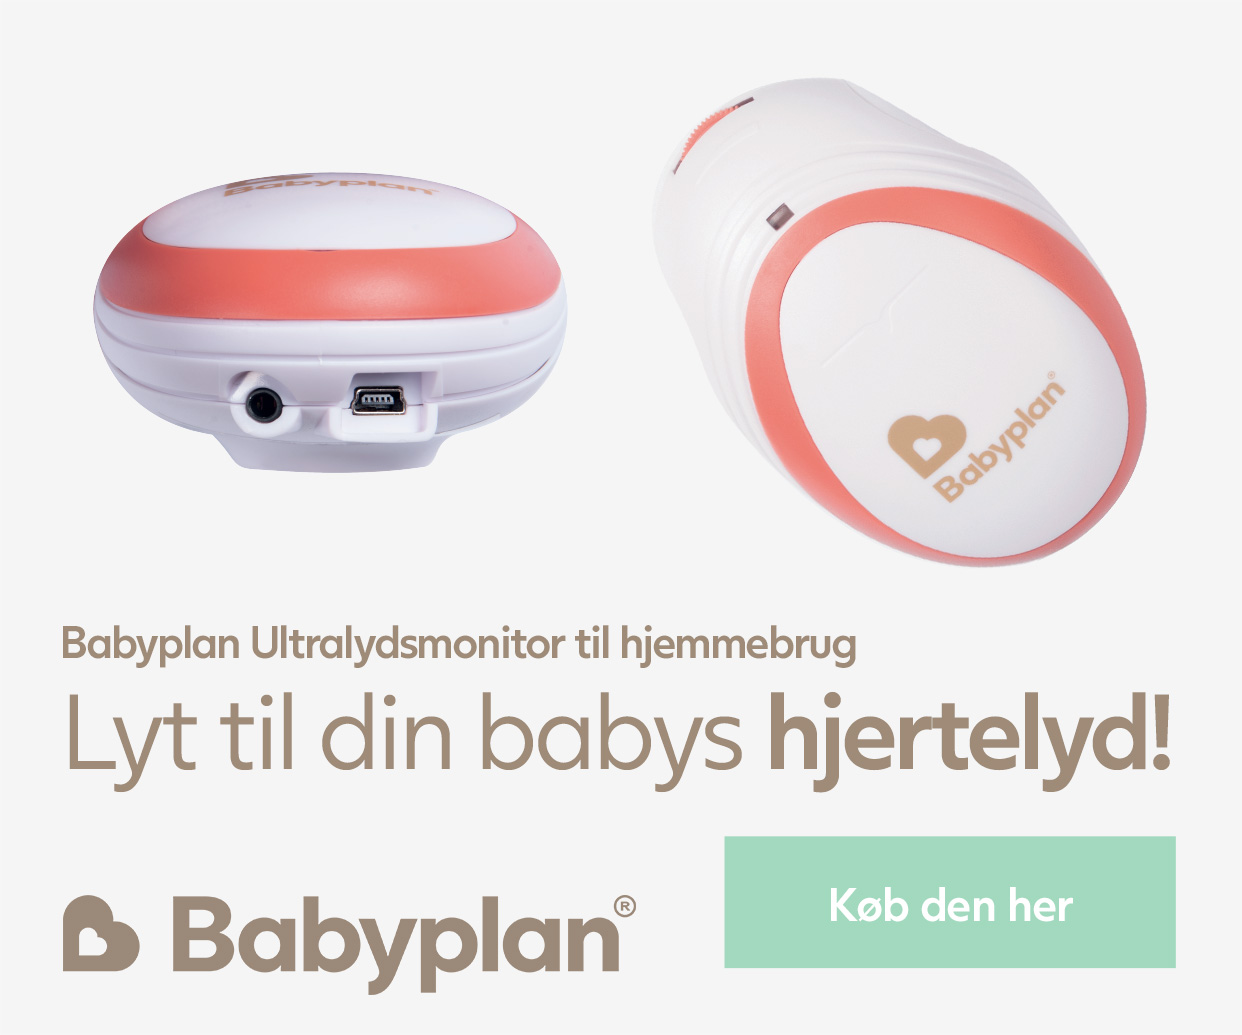 Babyplan ultralydsmonitor